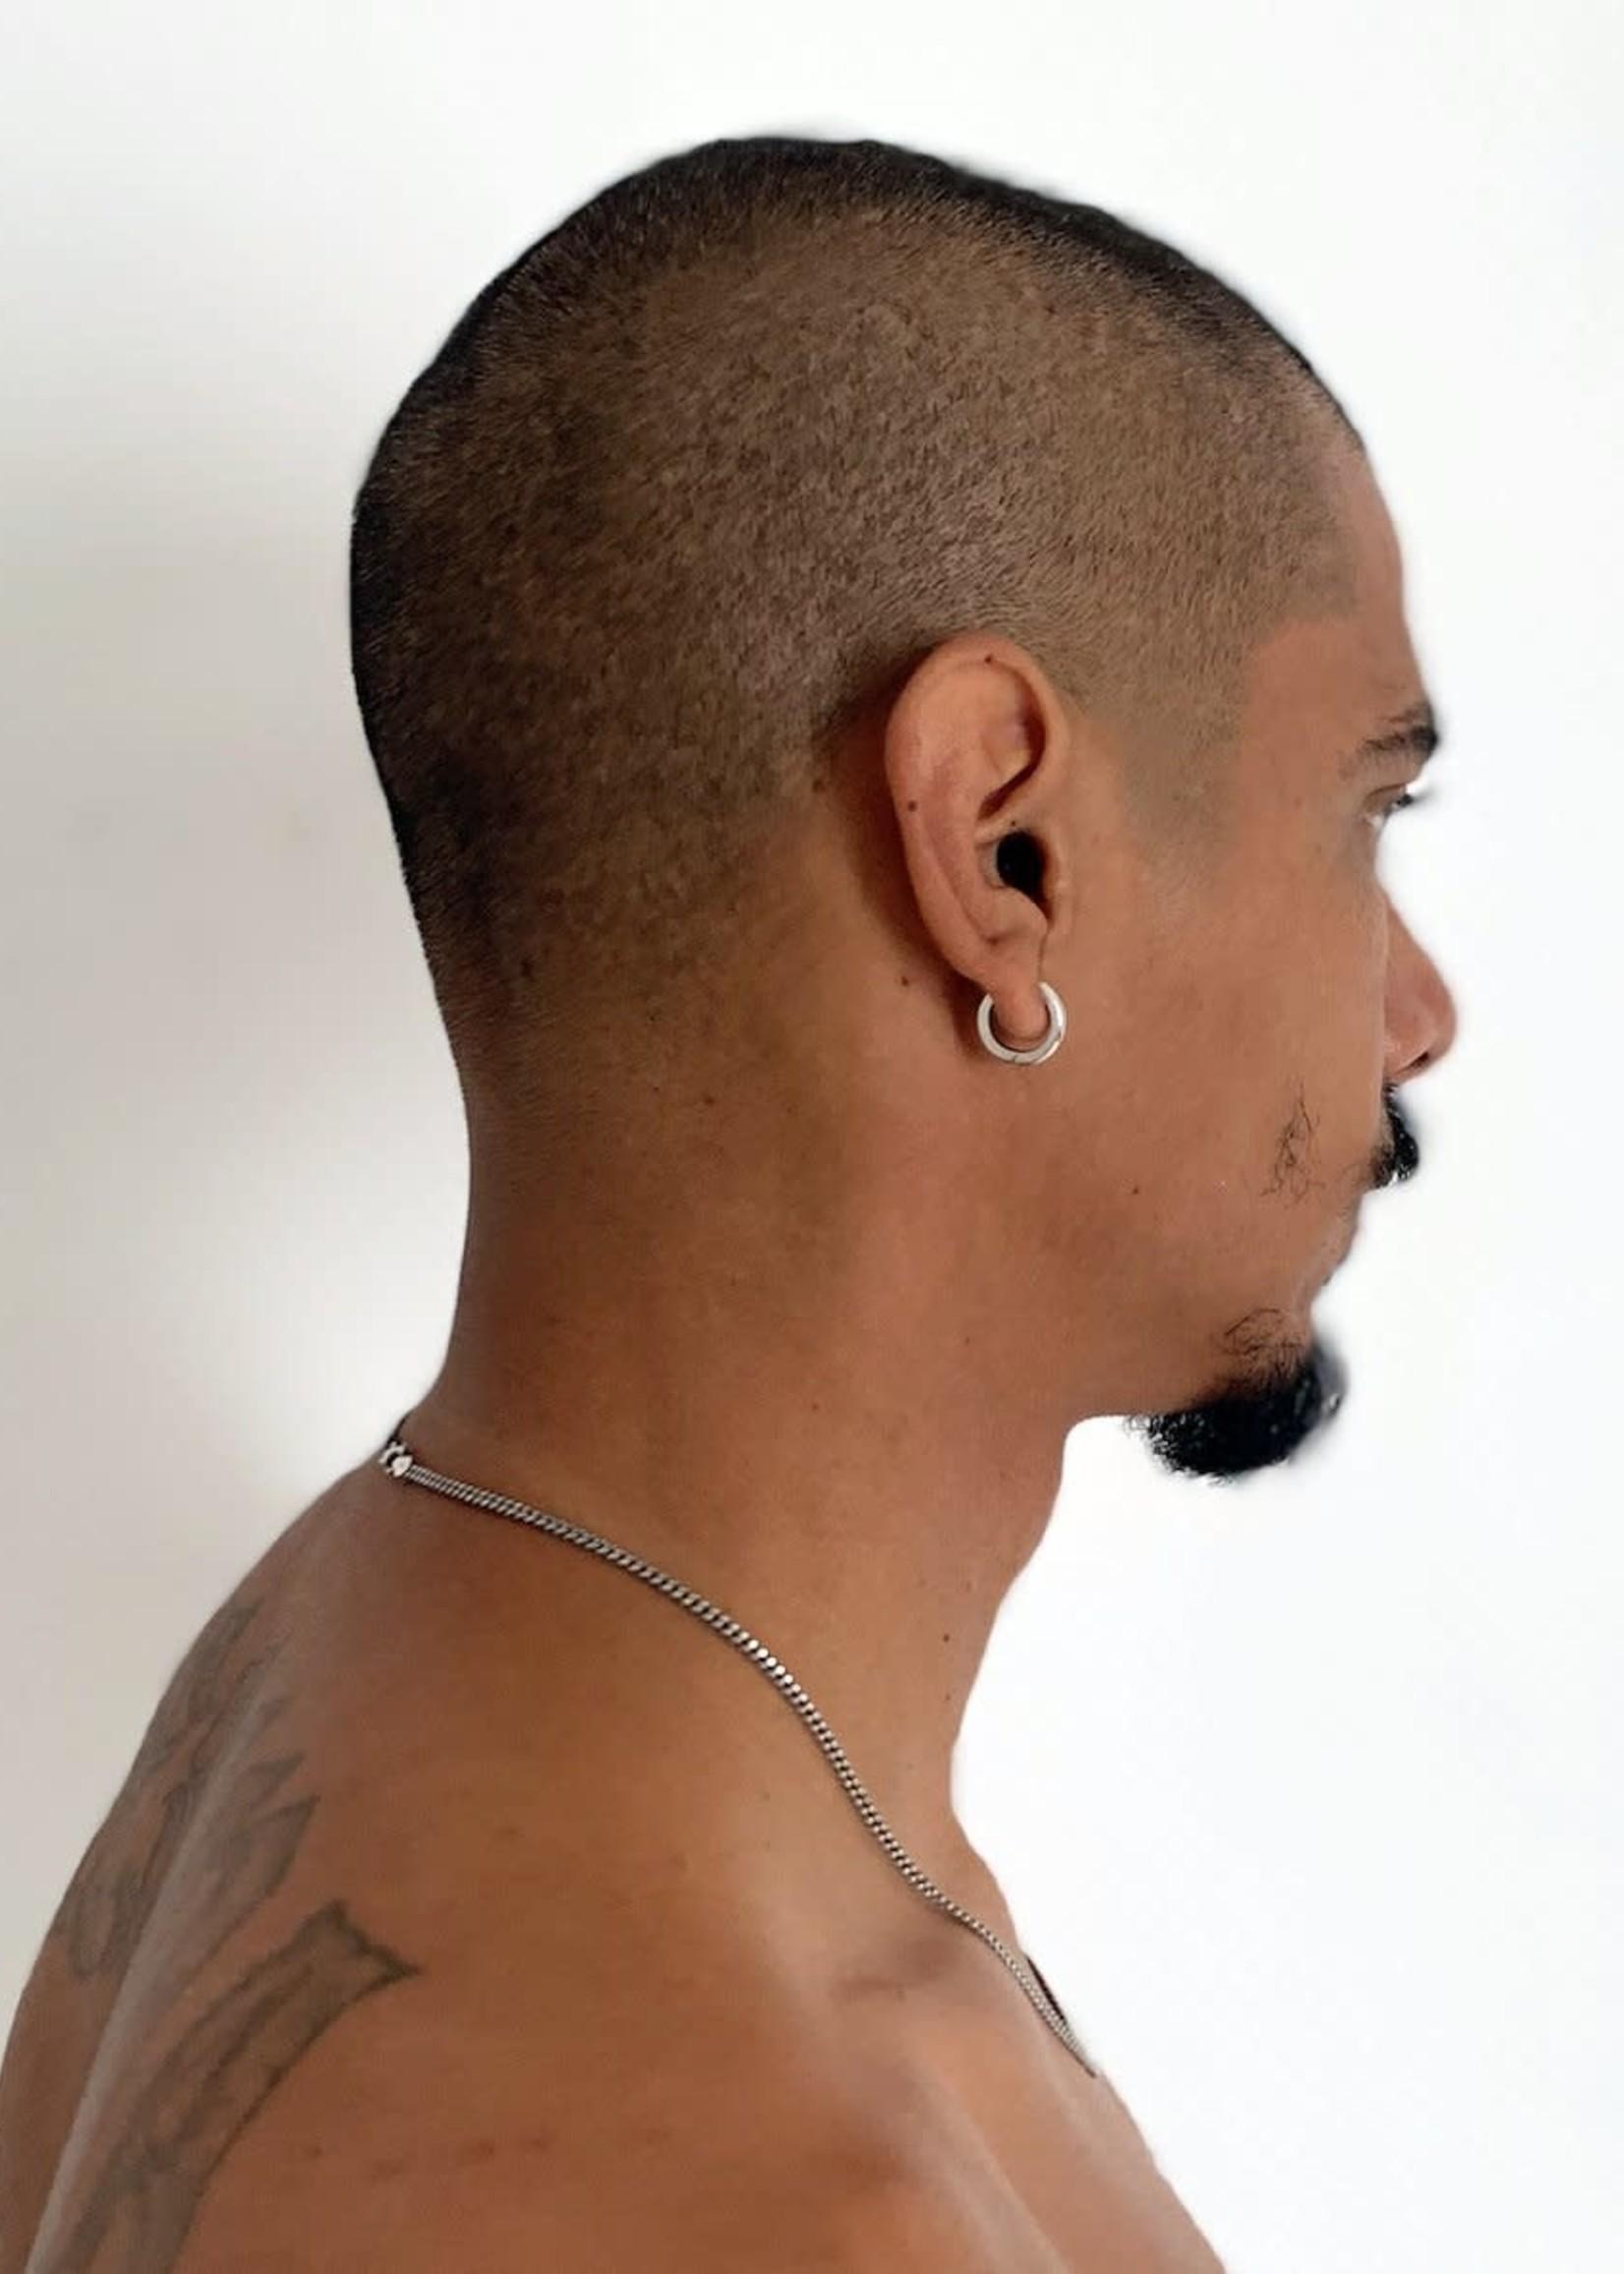 VARON Single Aro Earring in Sterling Silver